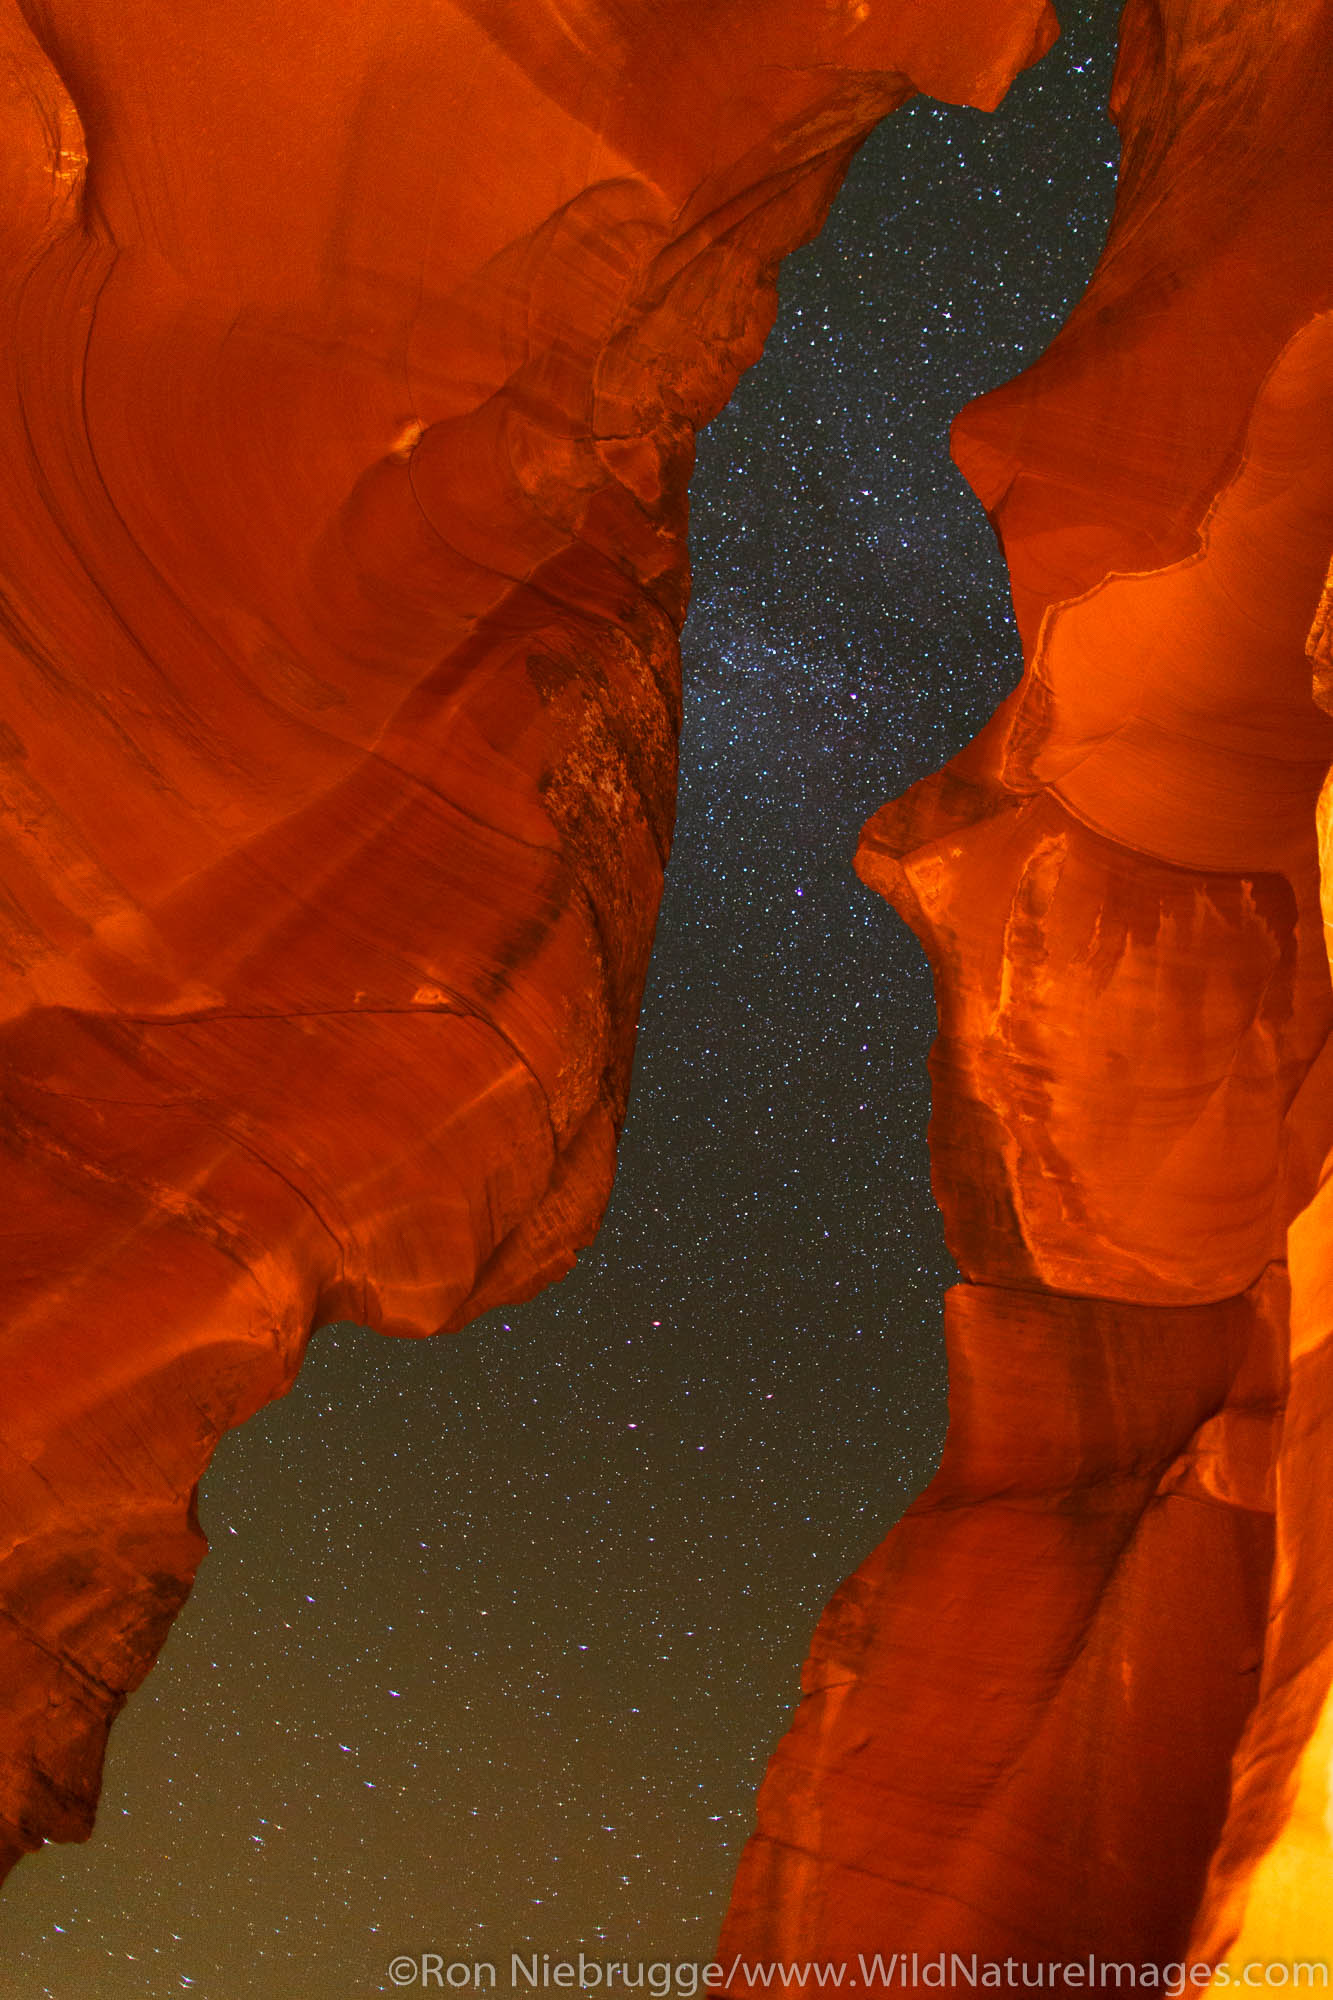 Night sky in Upper Antelope Slot Canyon, Navajo Park Land, Page, Arizona.